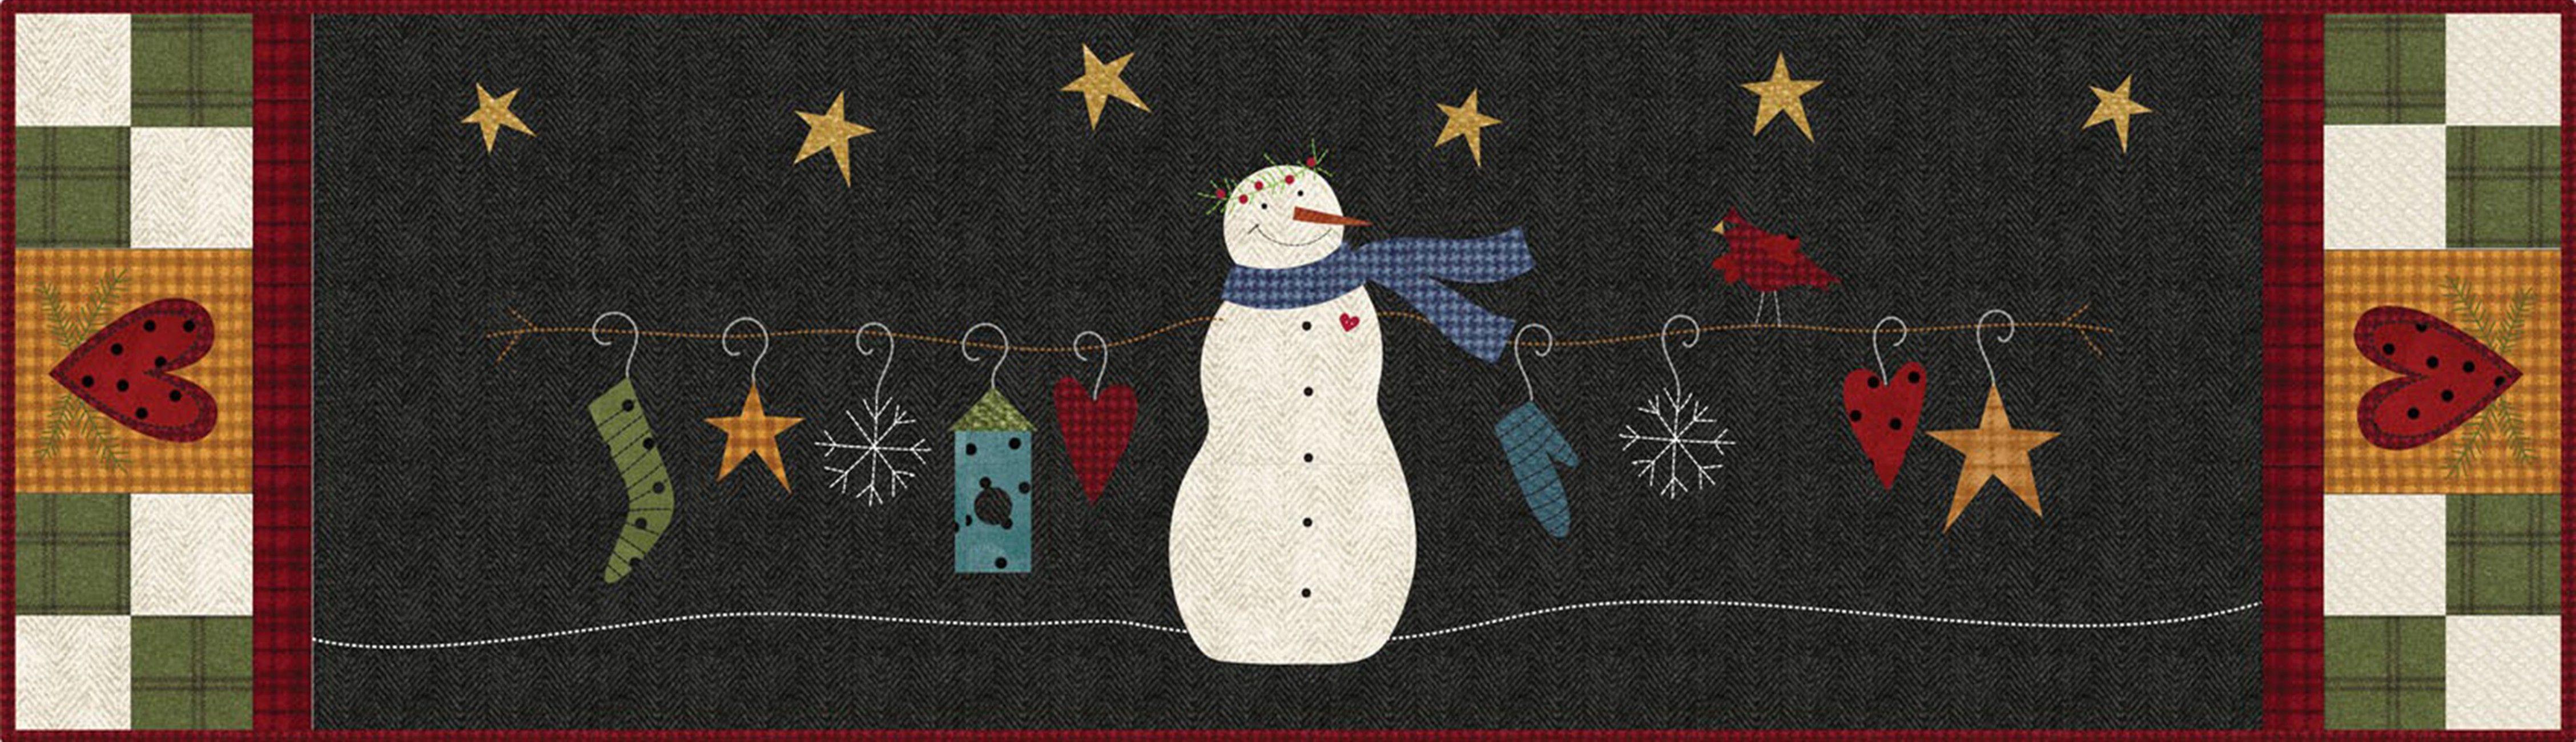 Holiday Tables, Table Runners, Felting, Feltro, Felt Fabric, Needle Felting